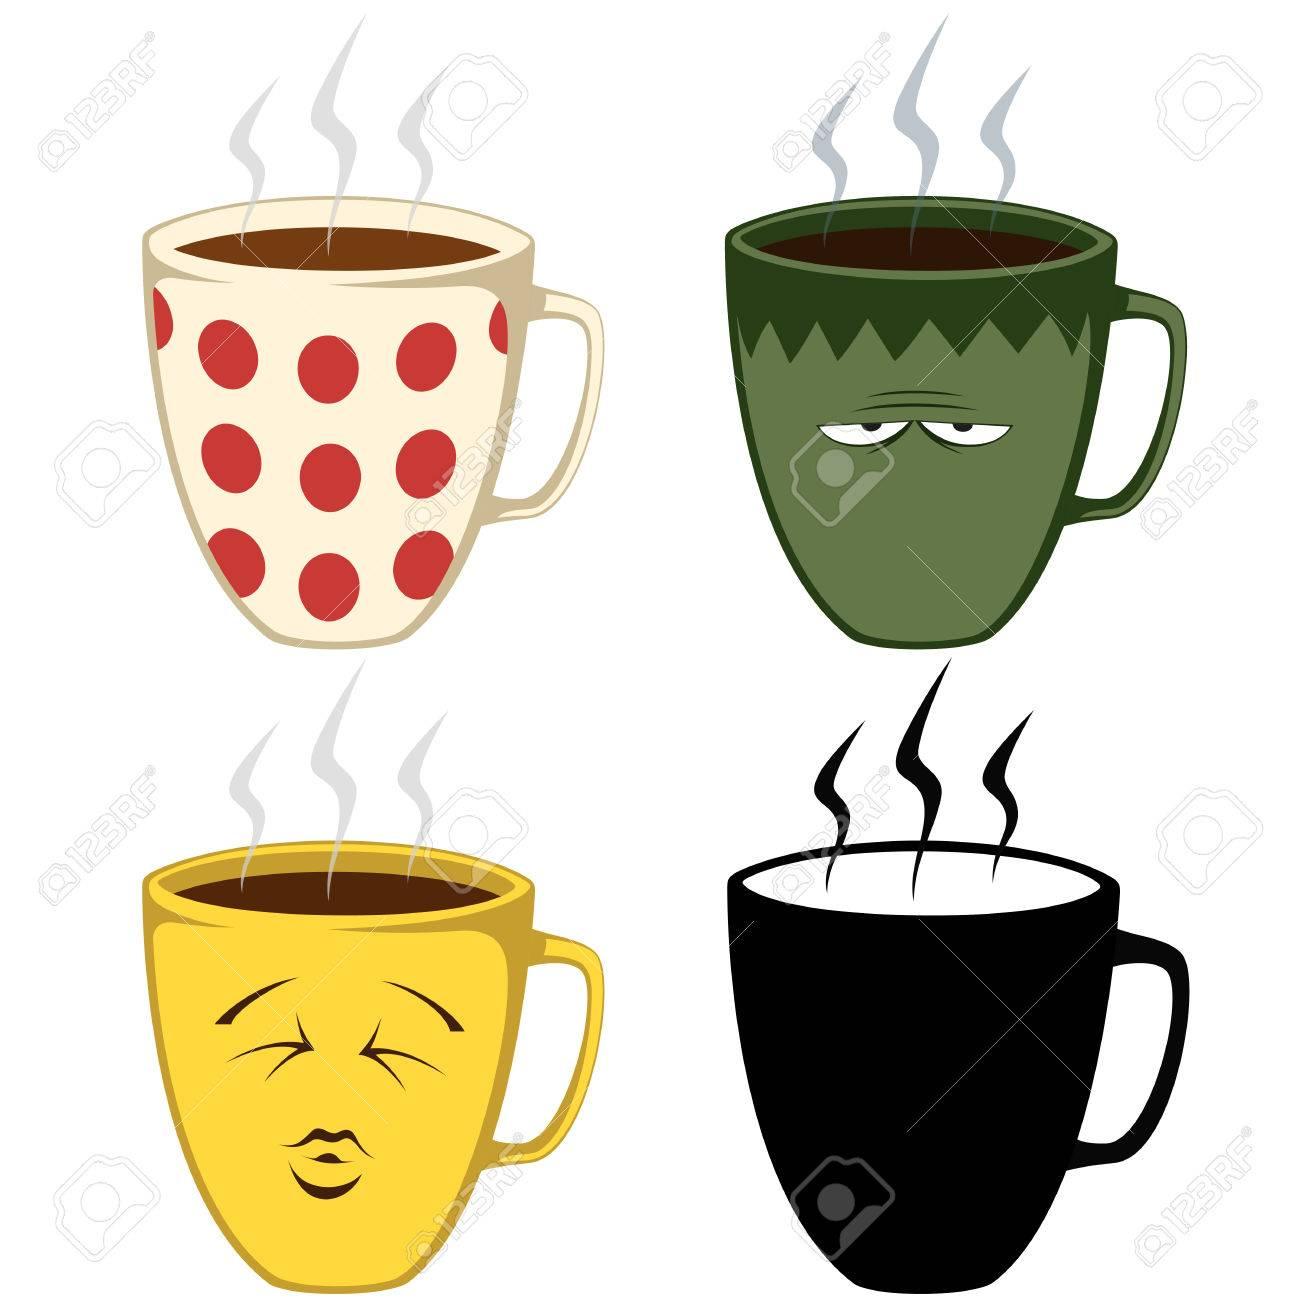 Set Of Coffee Mug Illustrations Royalty Free Cliparts Vectors And Stock Illustration Image 56717928